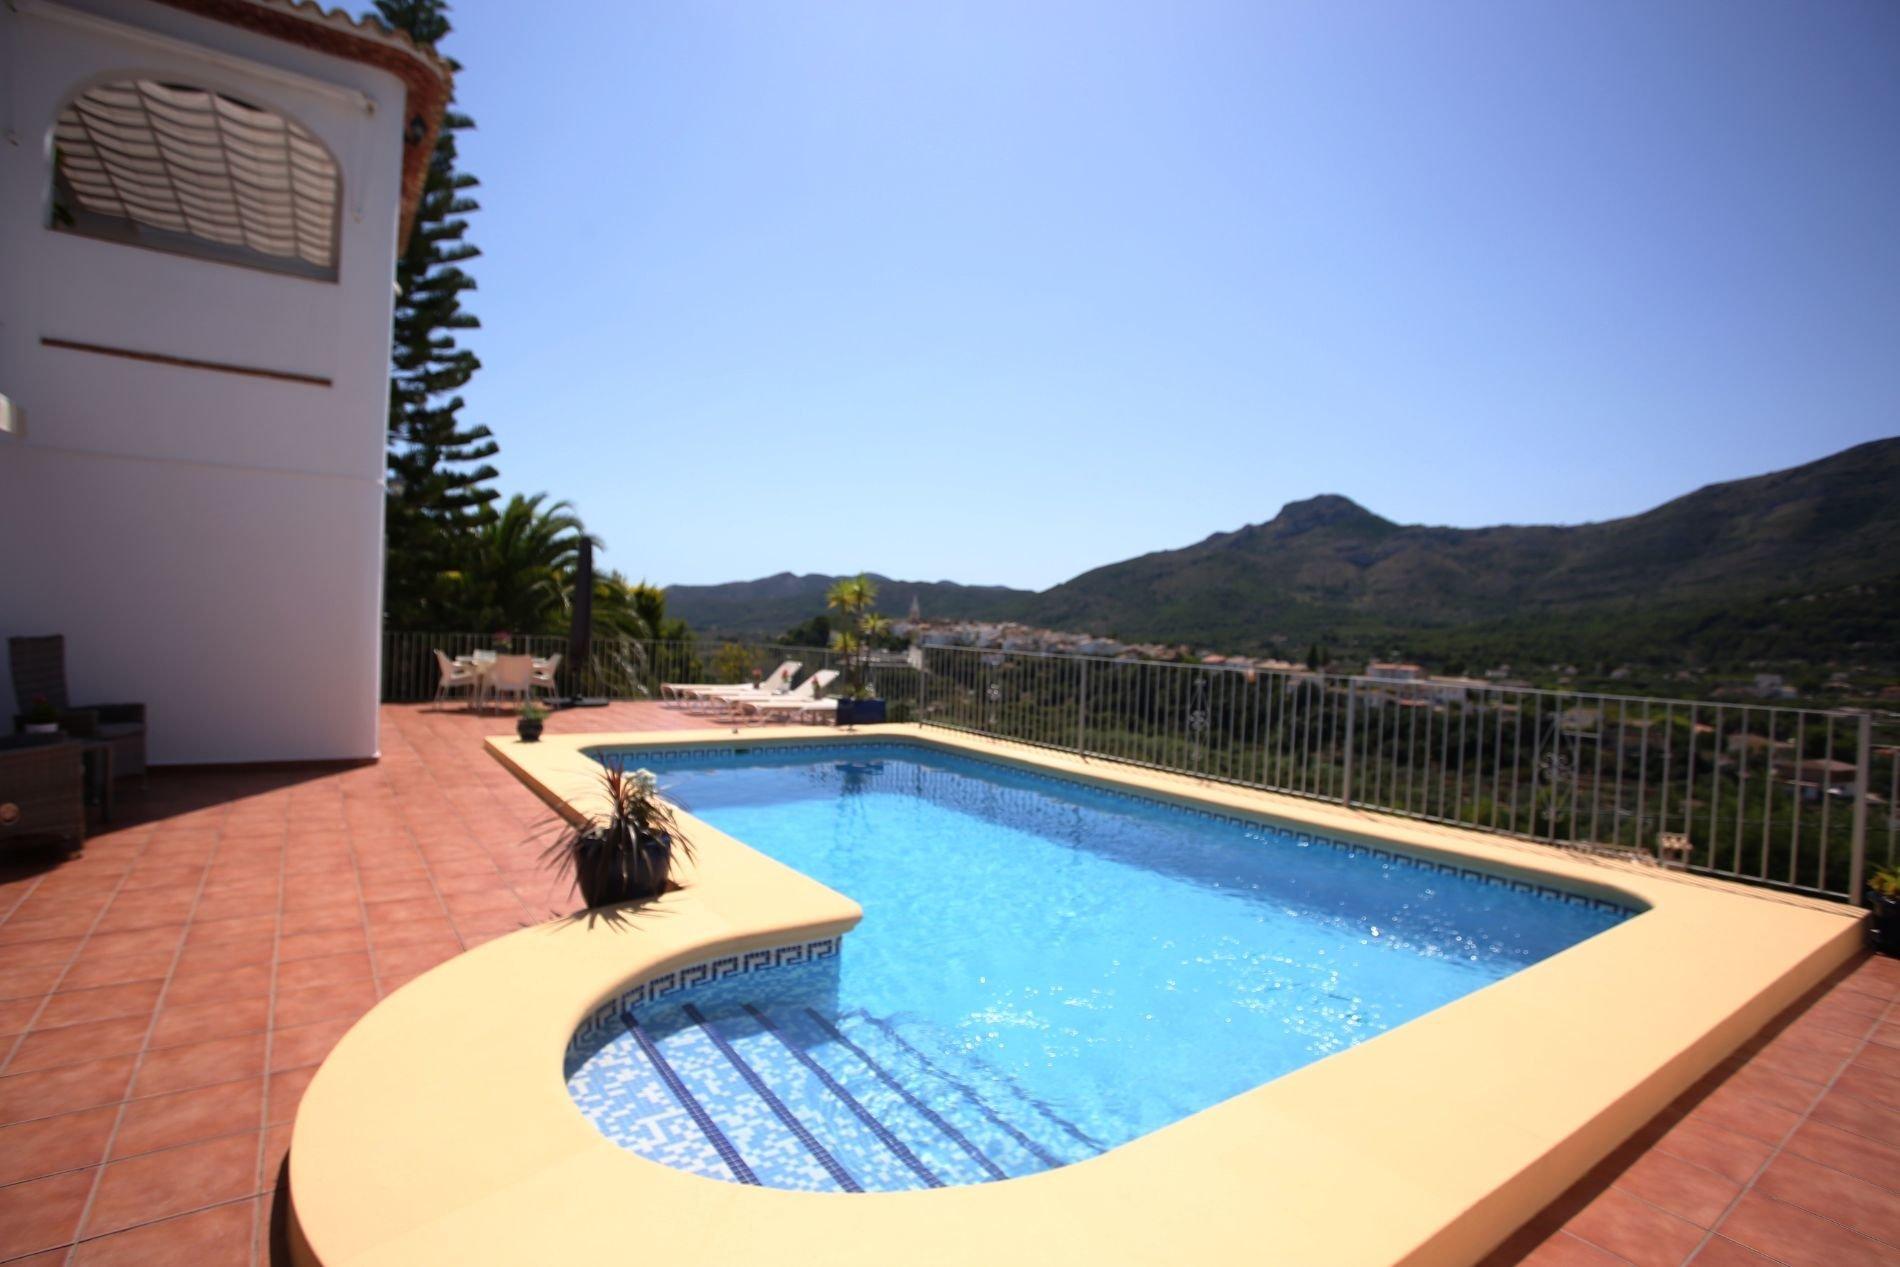 South facing villa with spectacular views